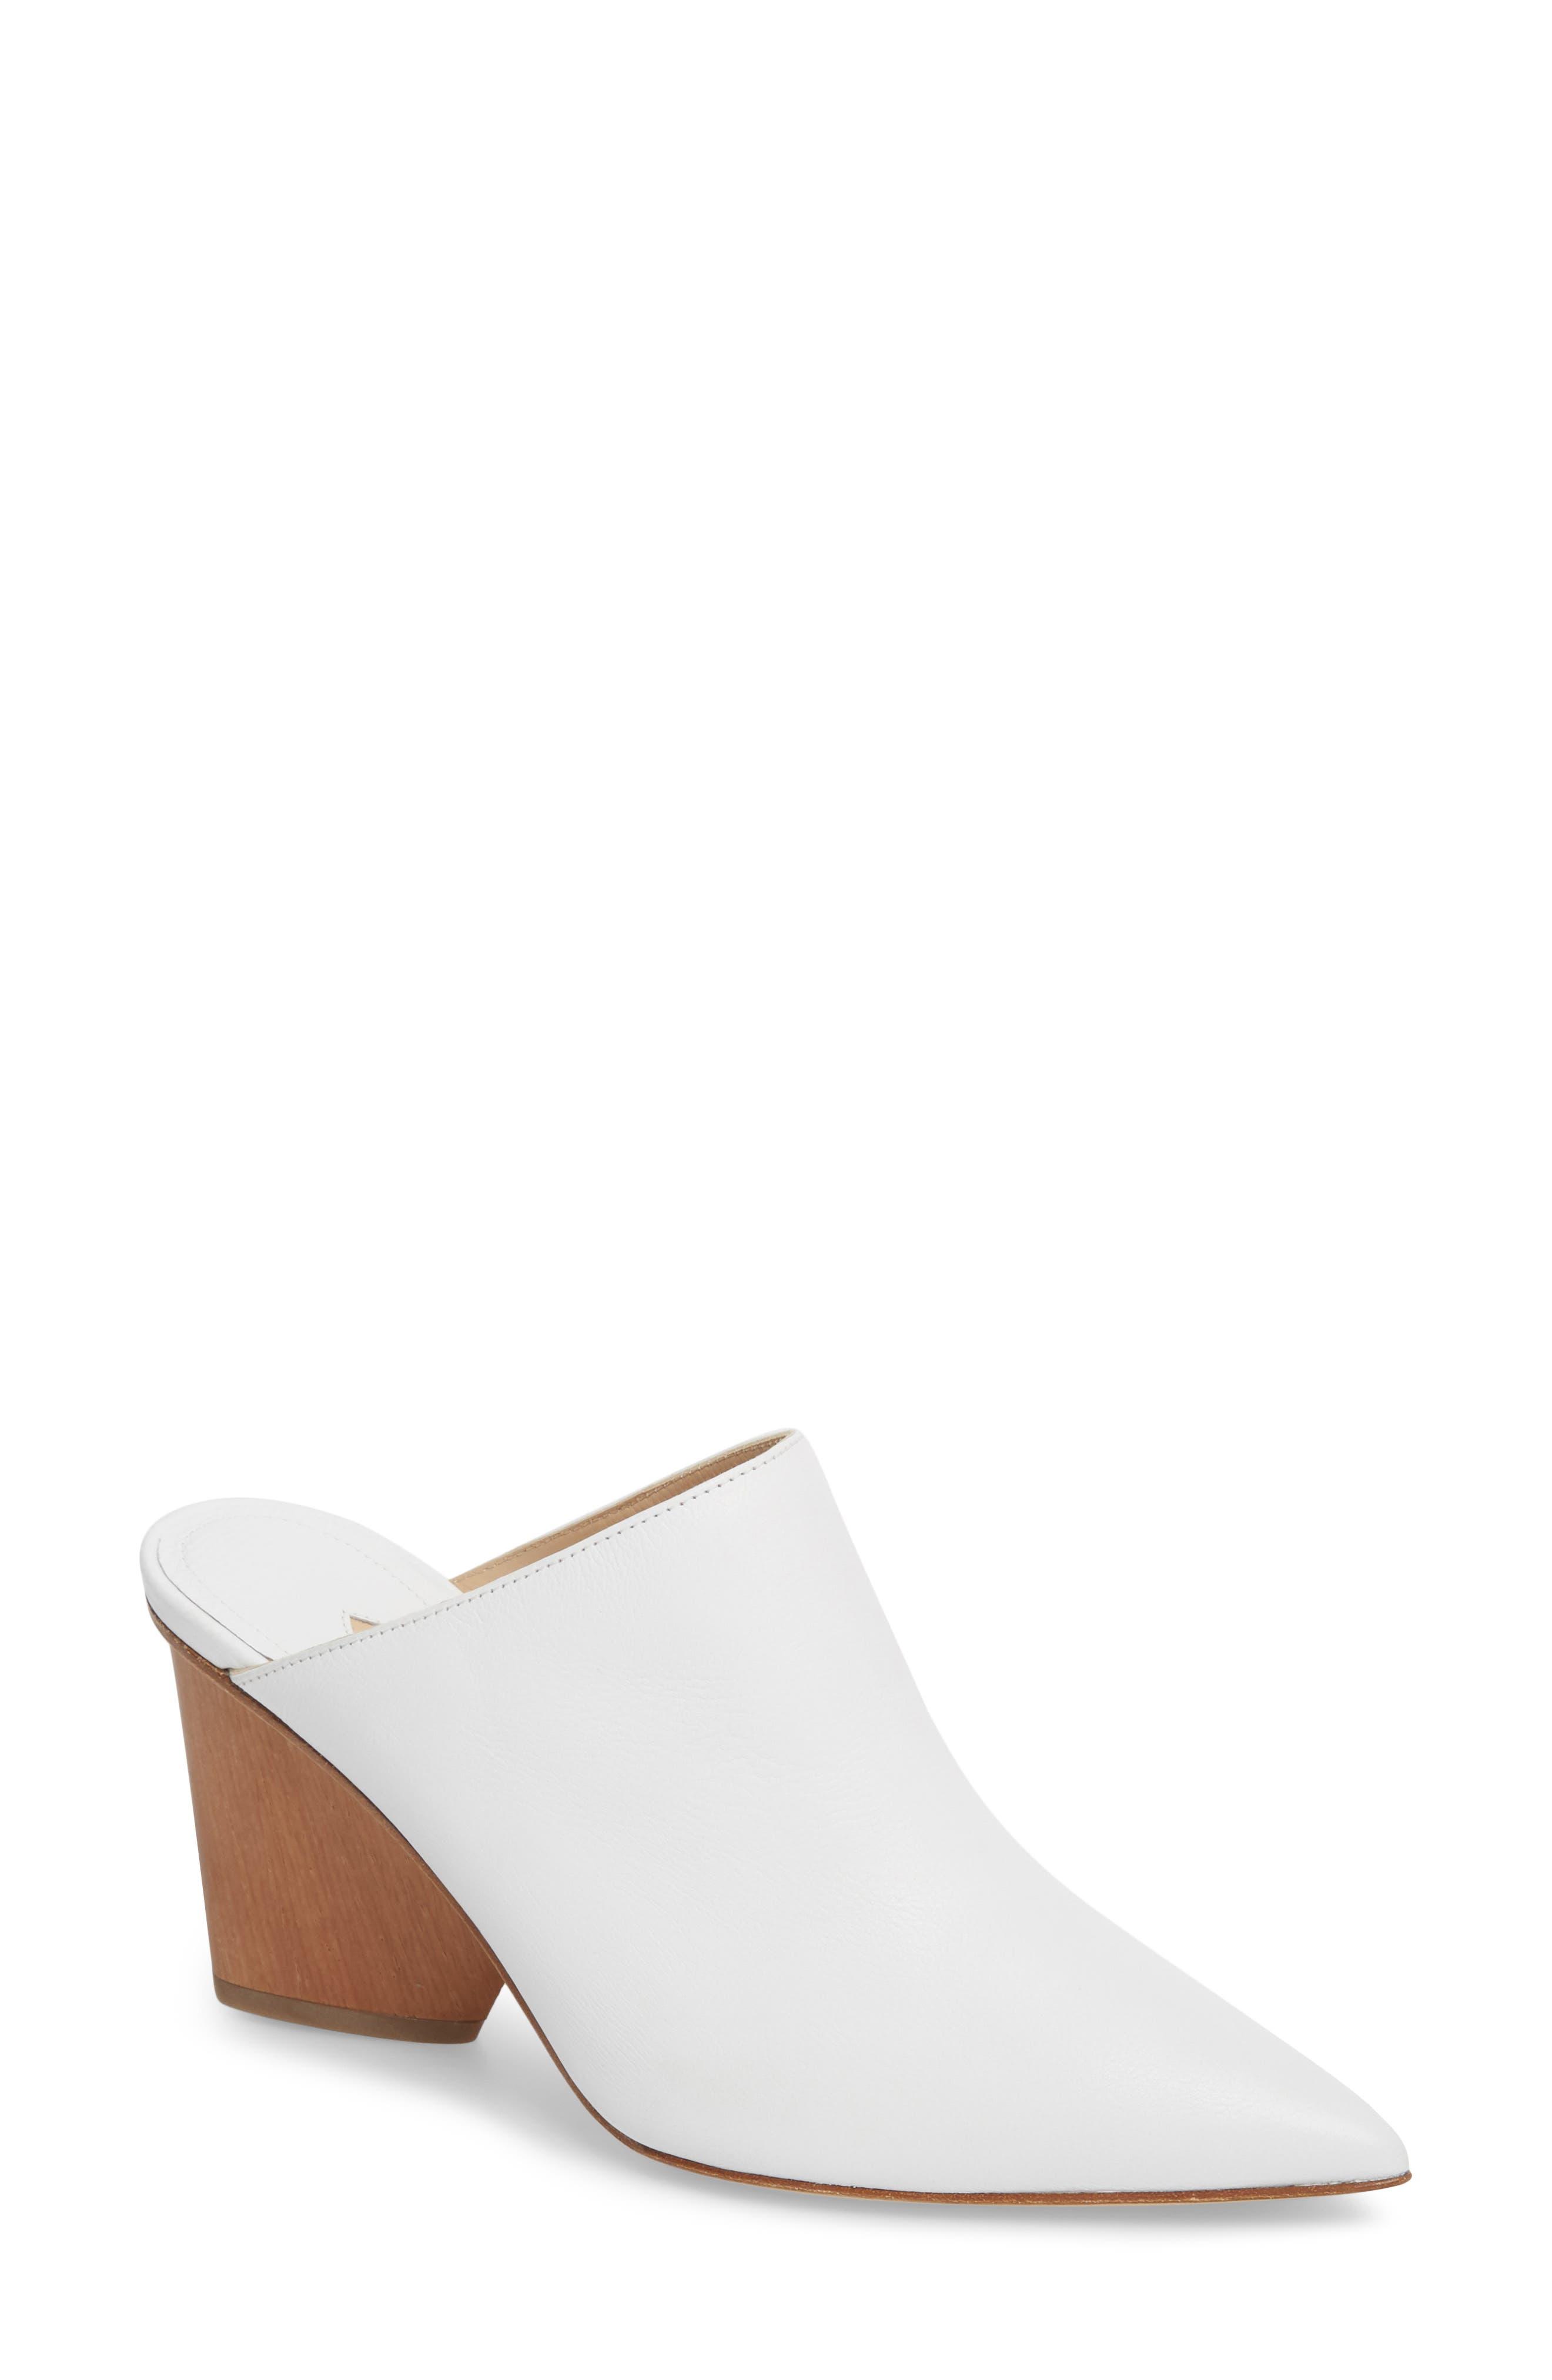 Ester Statement Heel Mule,                         Main,                         color, White